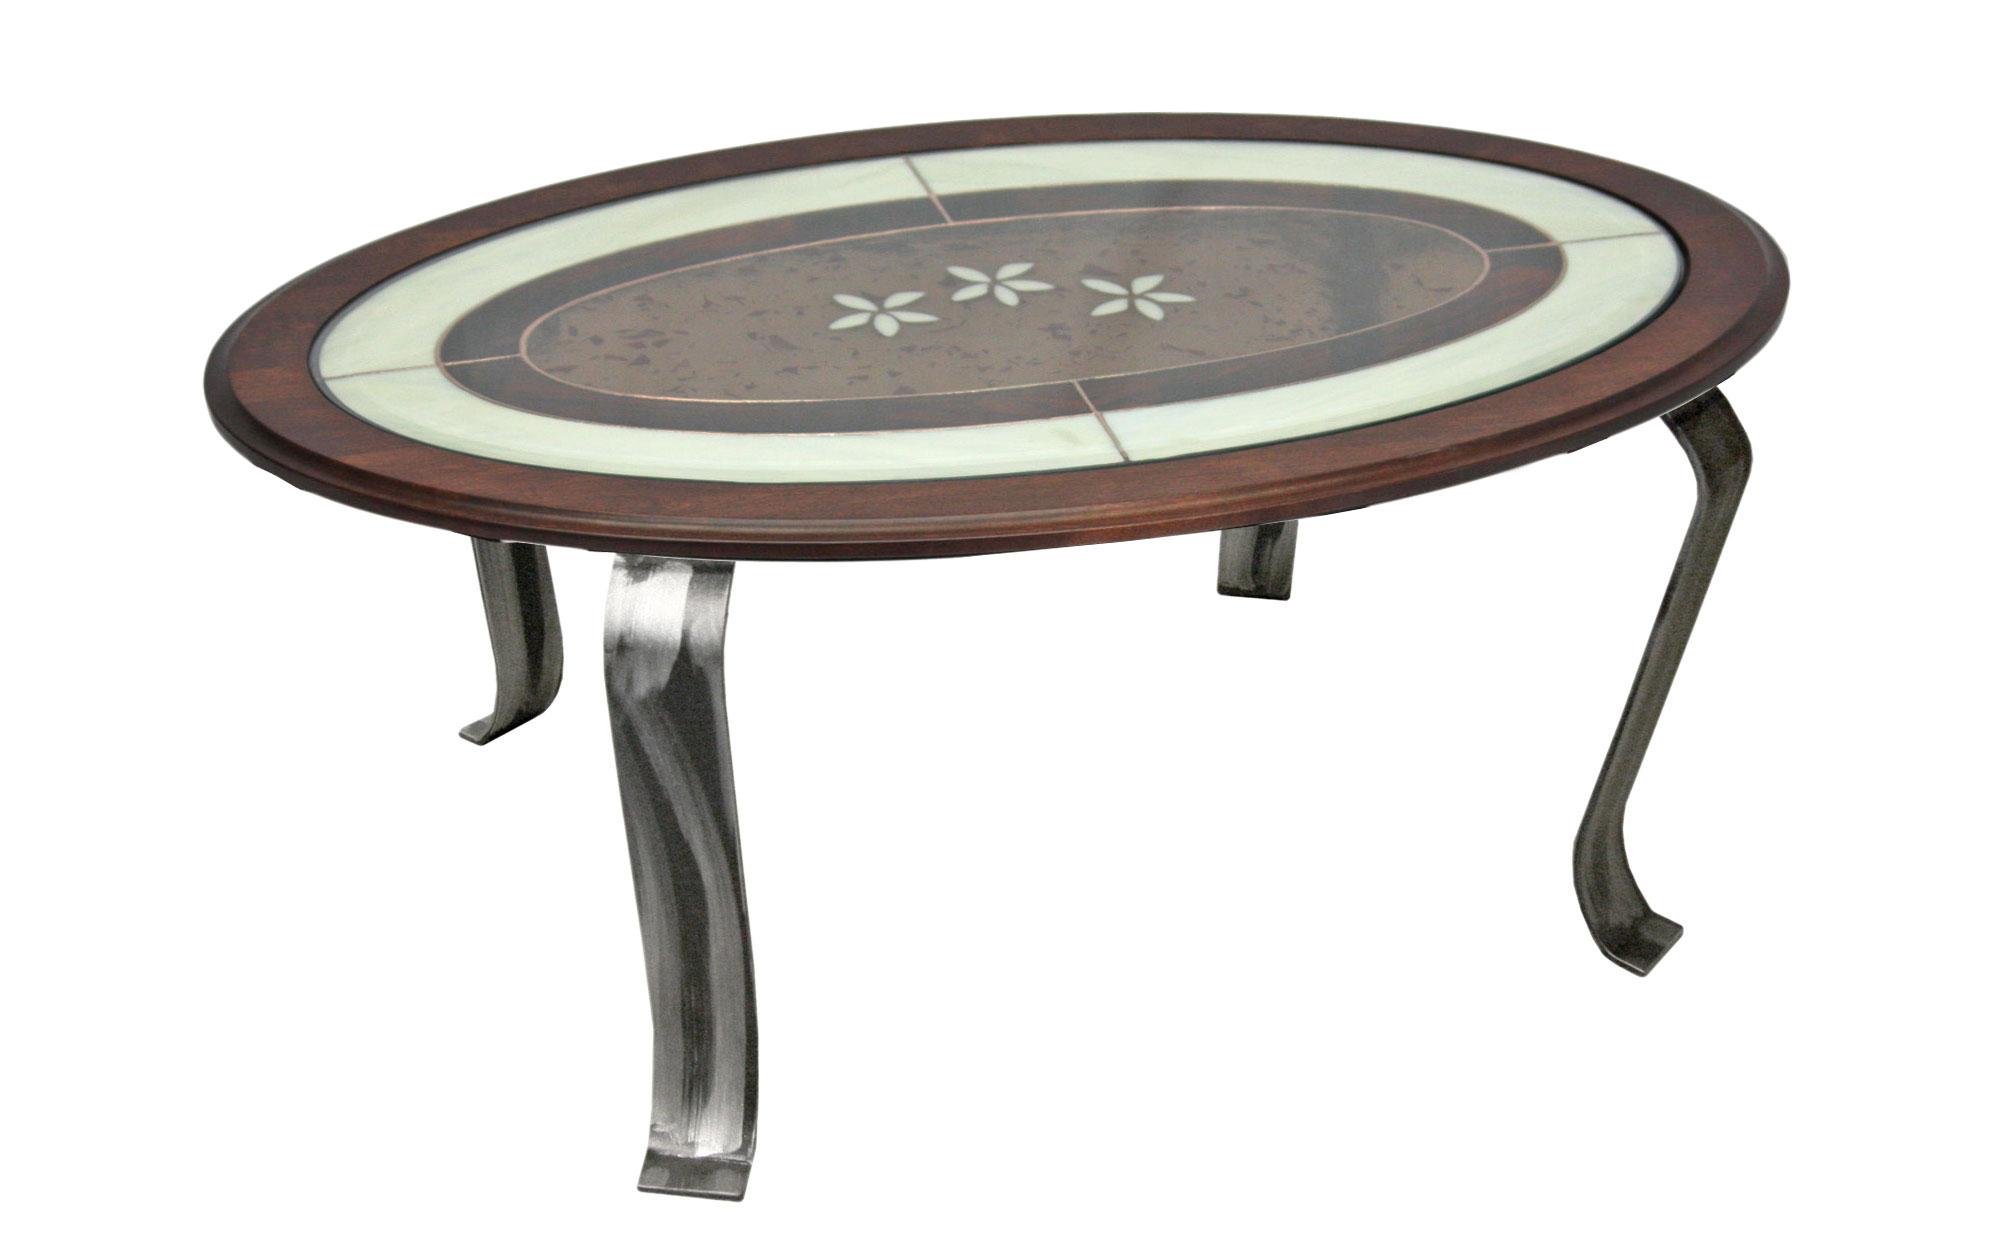 TABLE BASSE VITRAIL